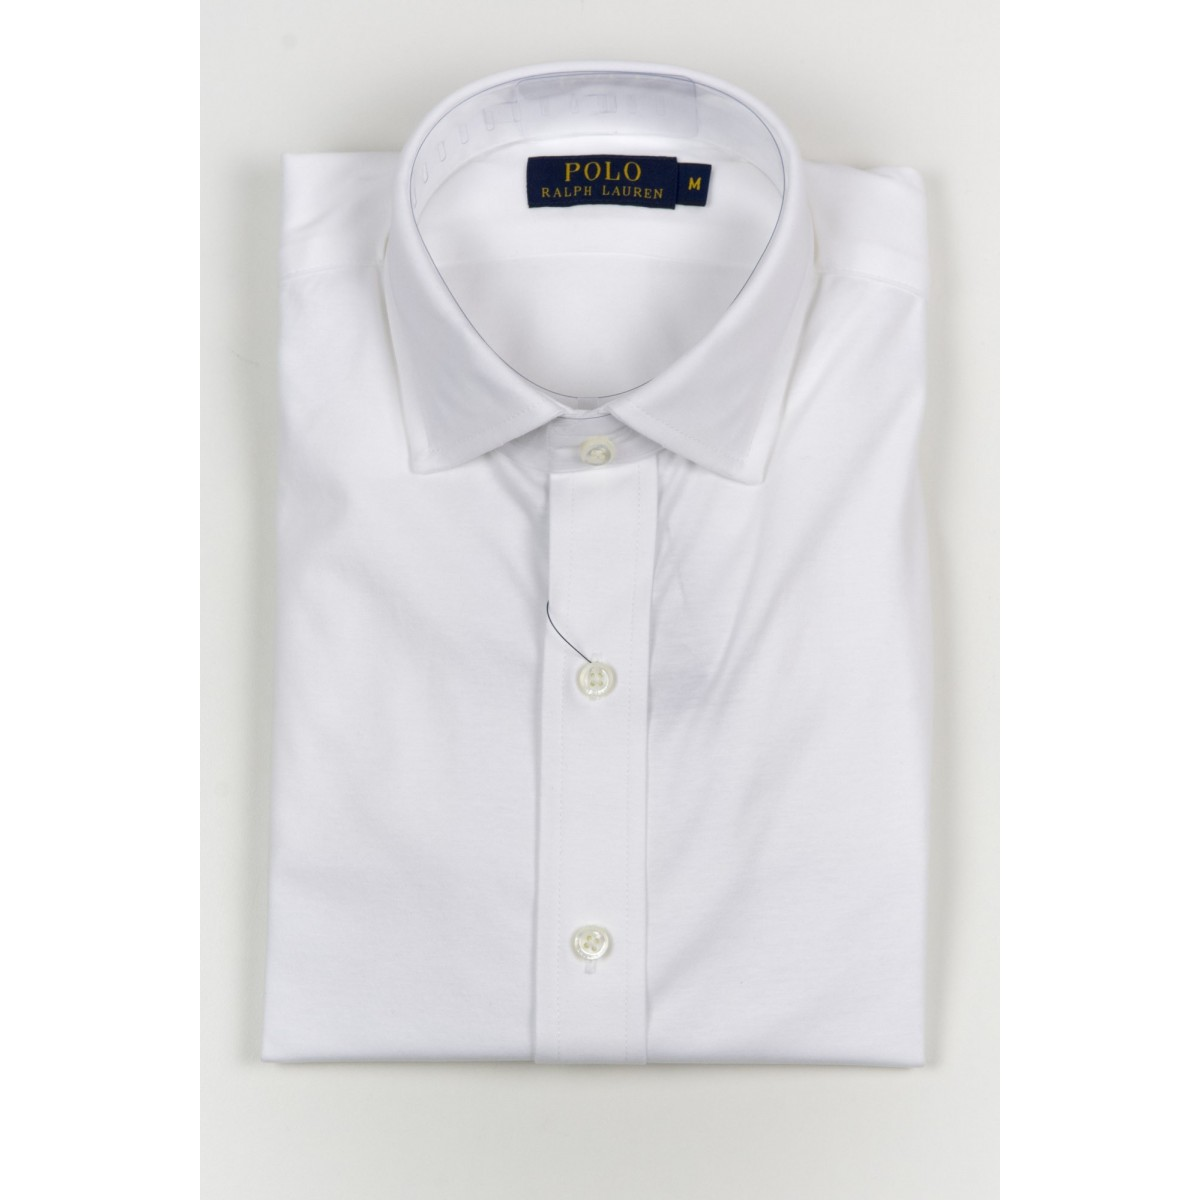 Camicia uomo Ralph lauren - A10kjp18cways A1000 Bianco